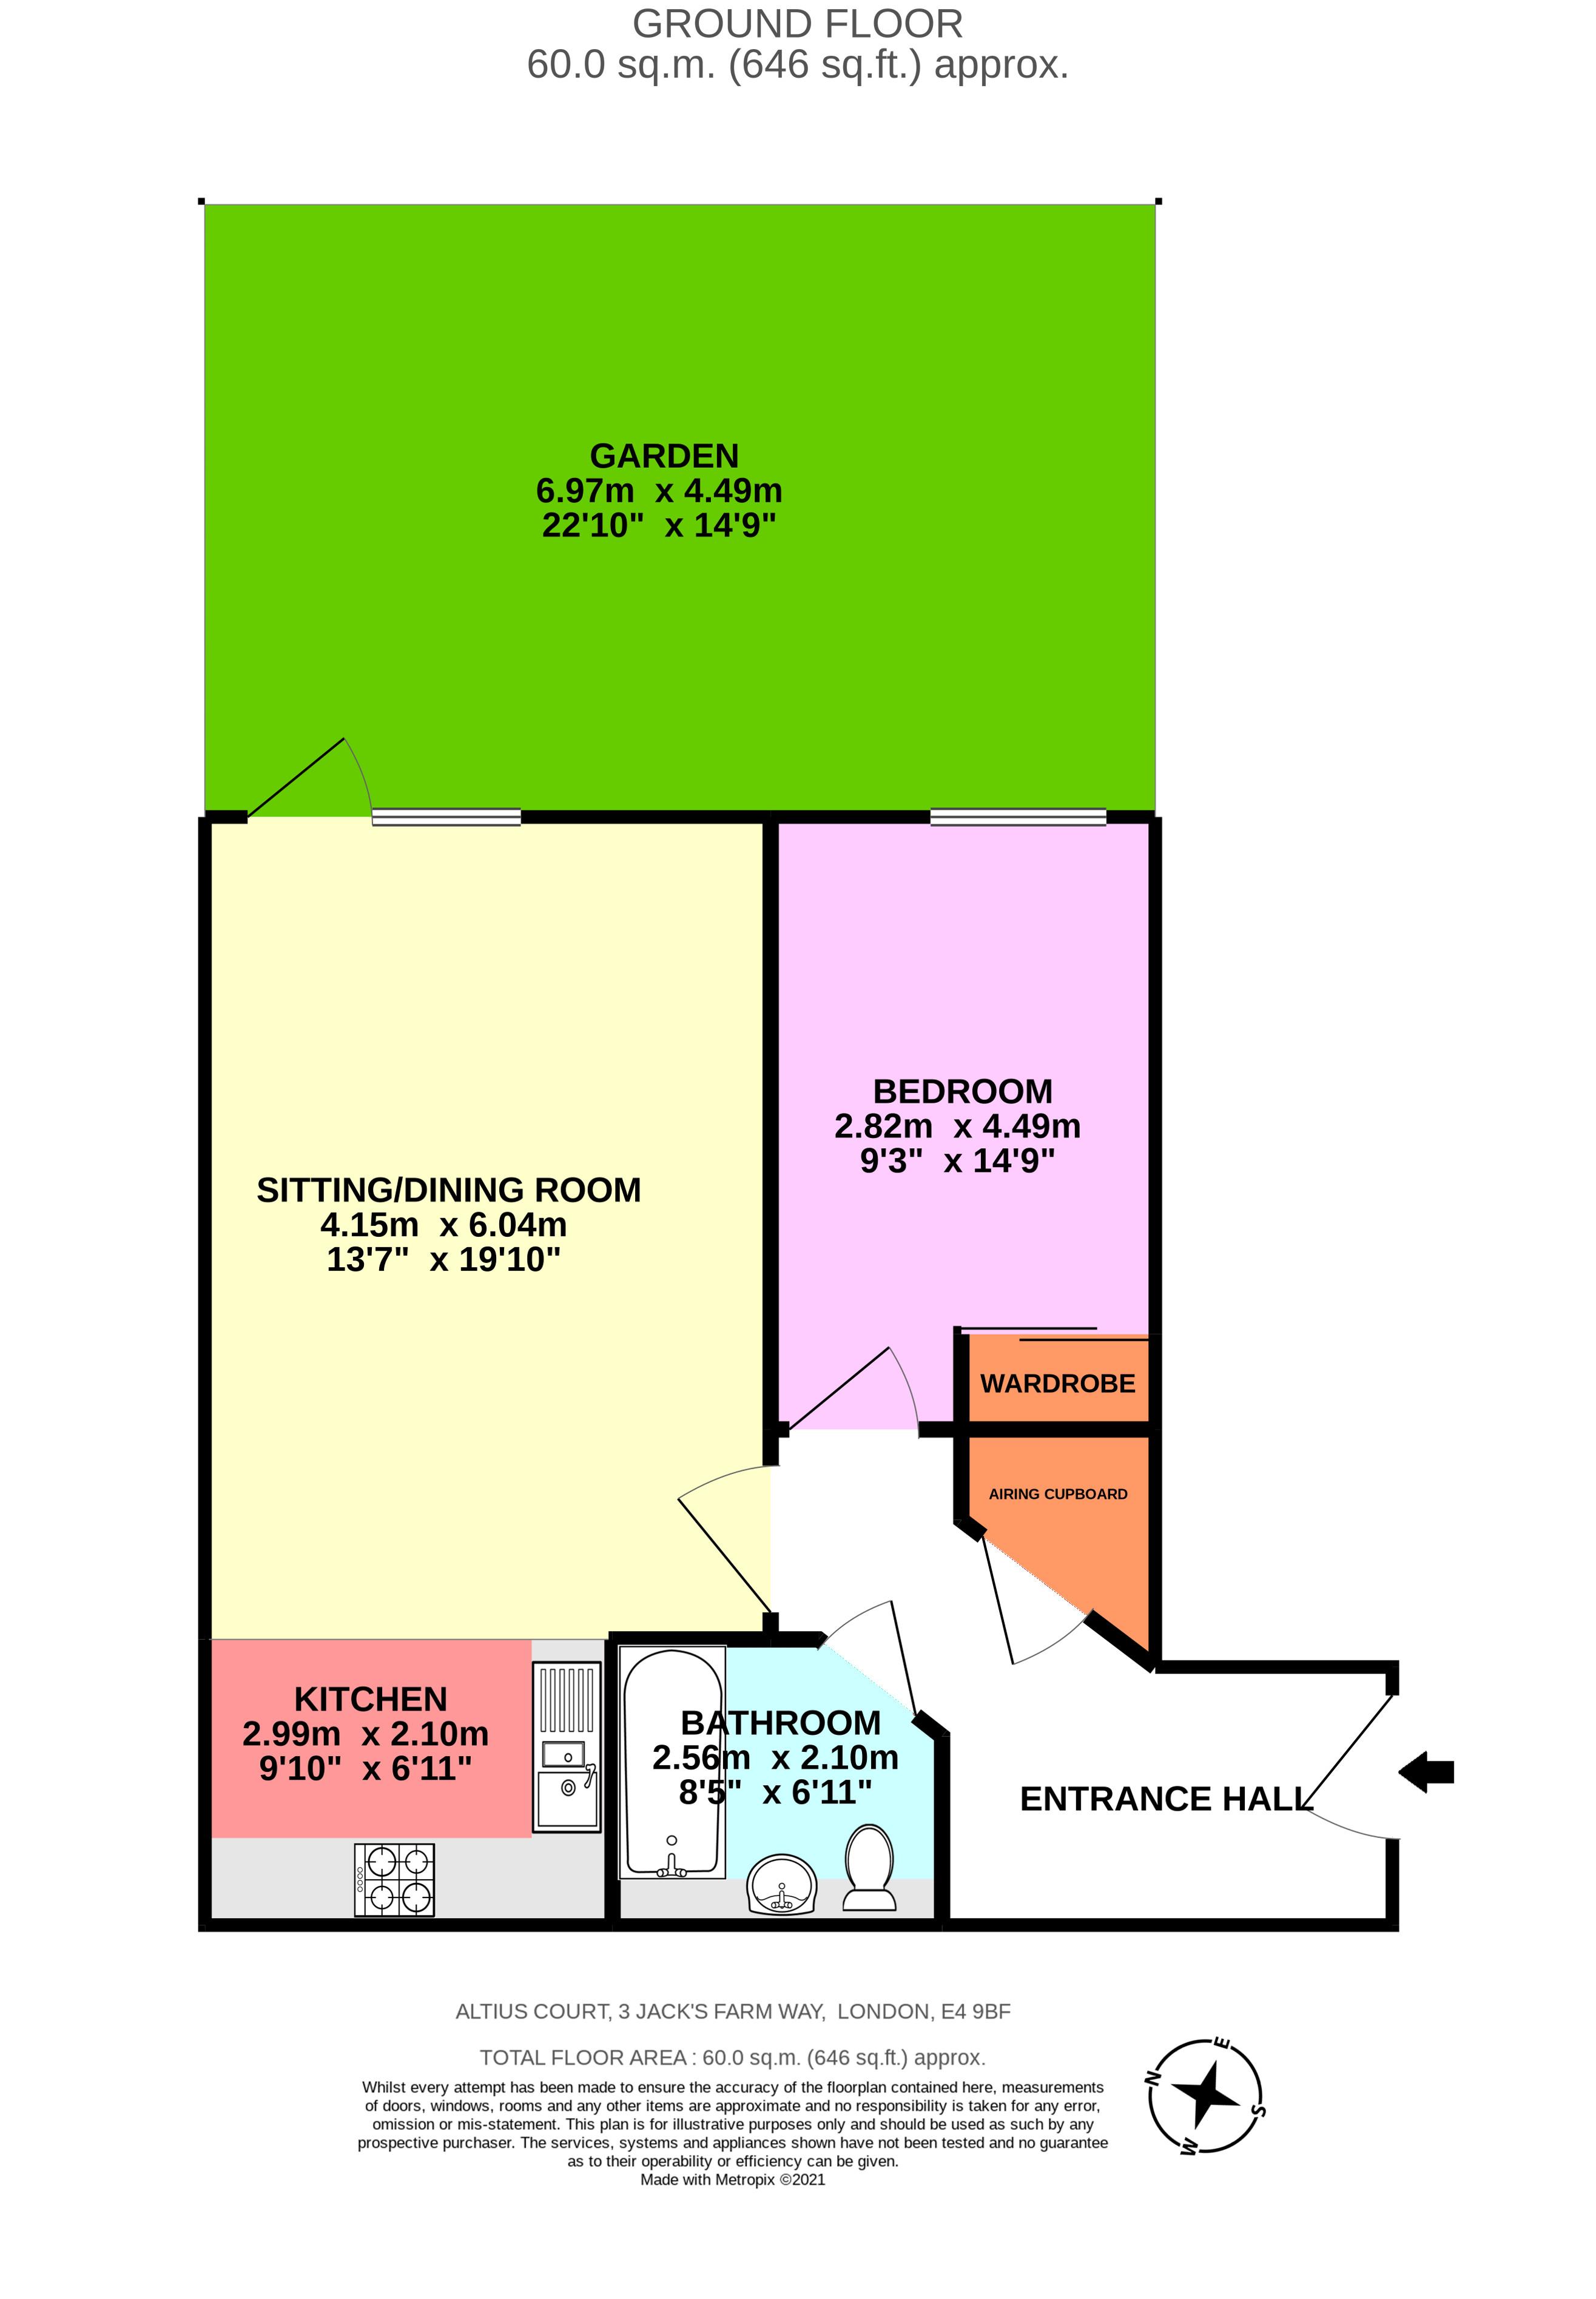 customer_1/branch_3/client_46325/sale_property/49AltiusCourt3JacksF_1629376153.jpeg